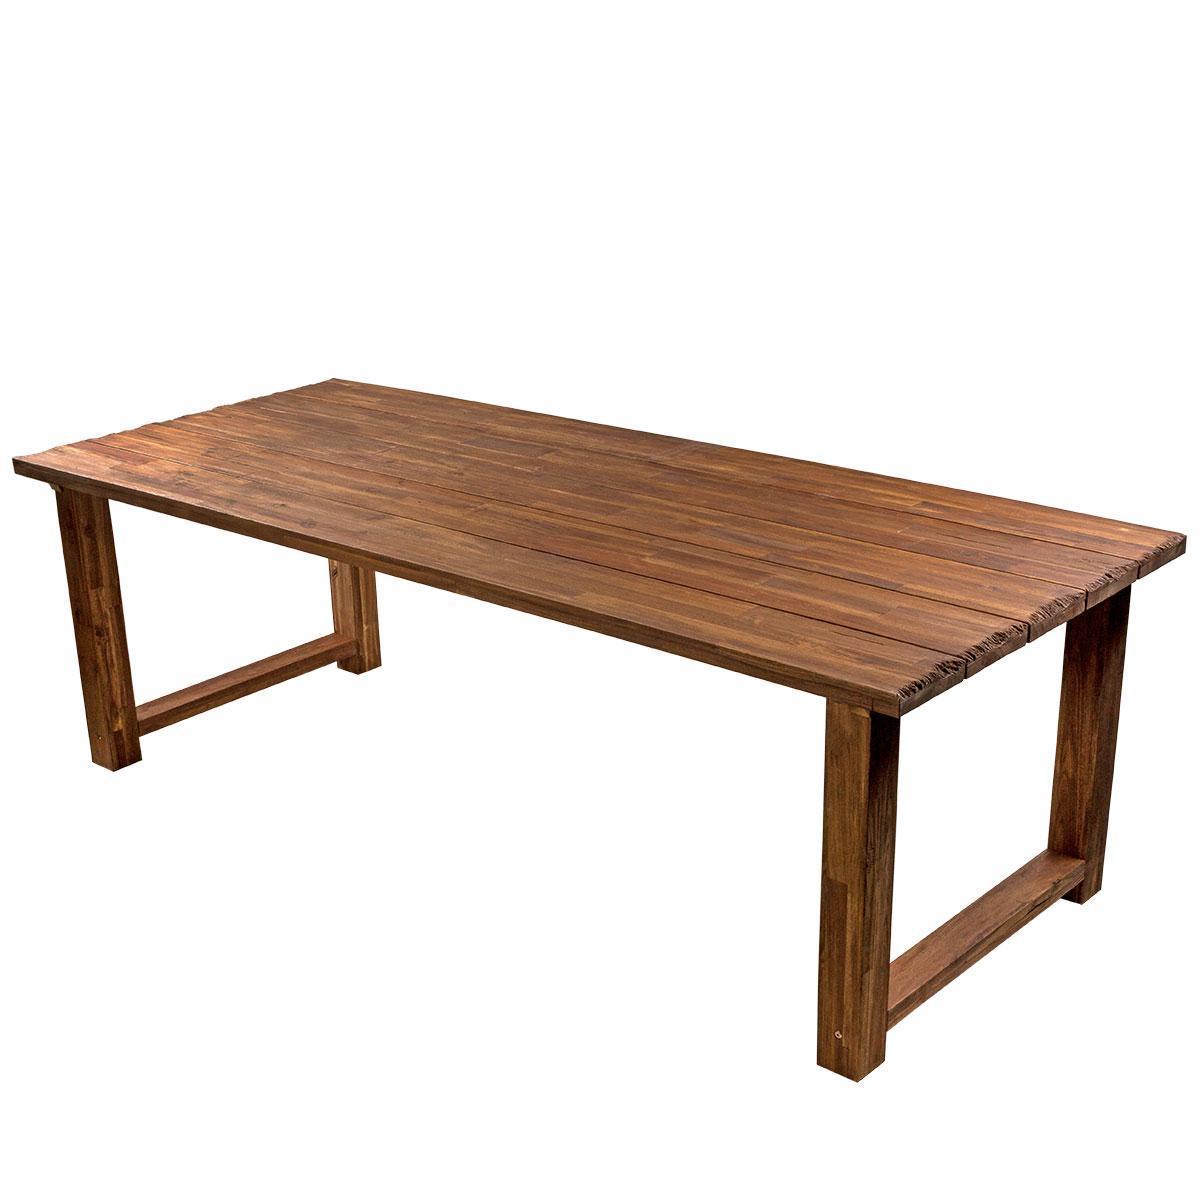 Стол деревянный обеденный Matera